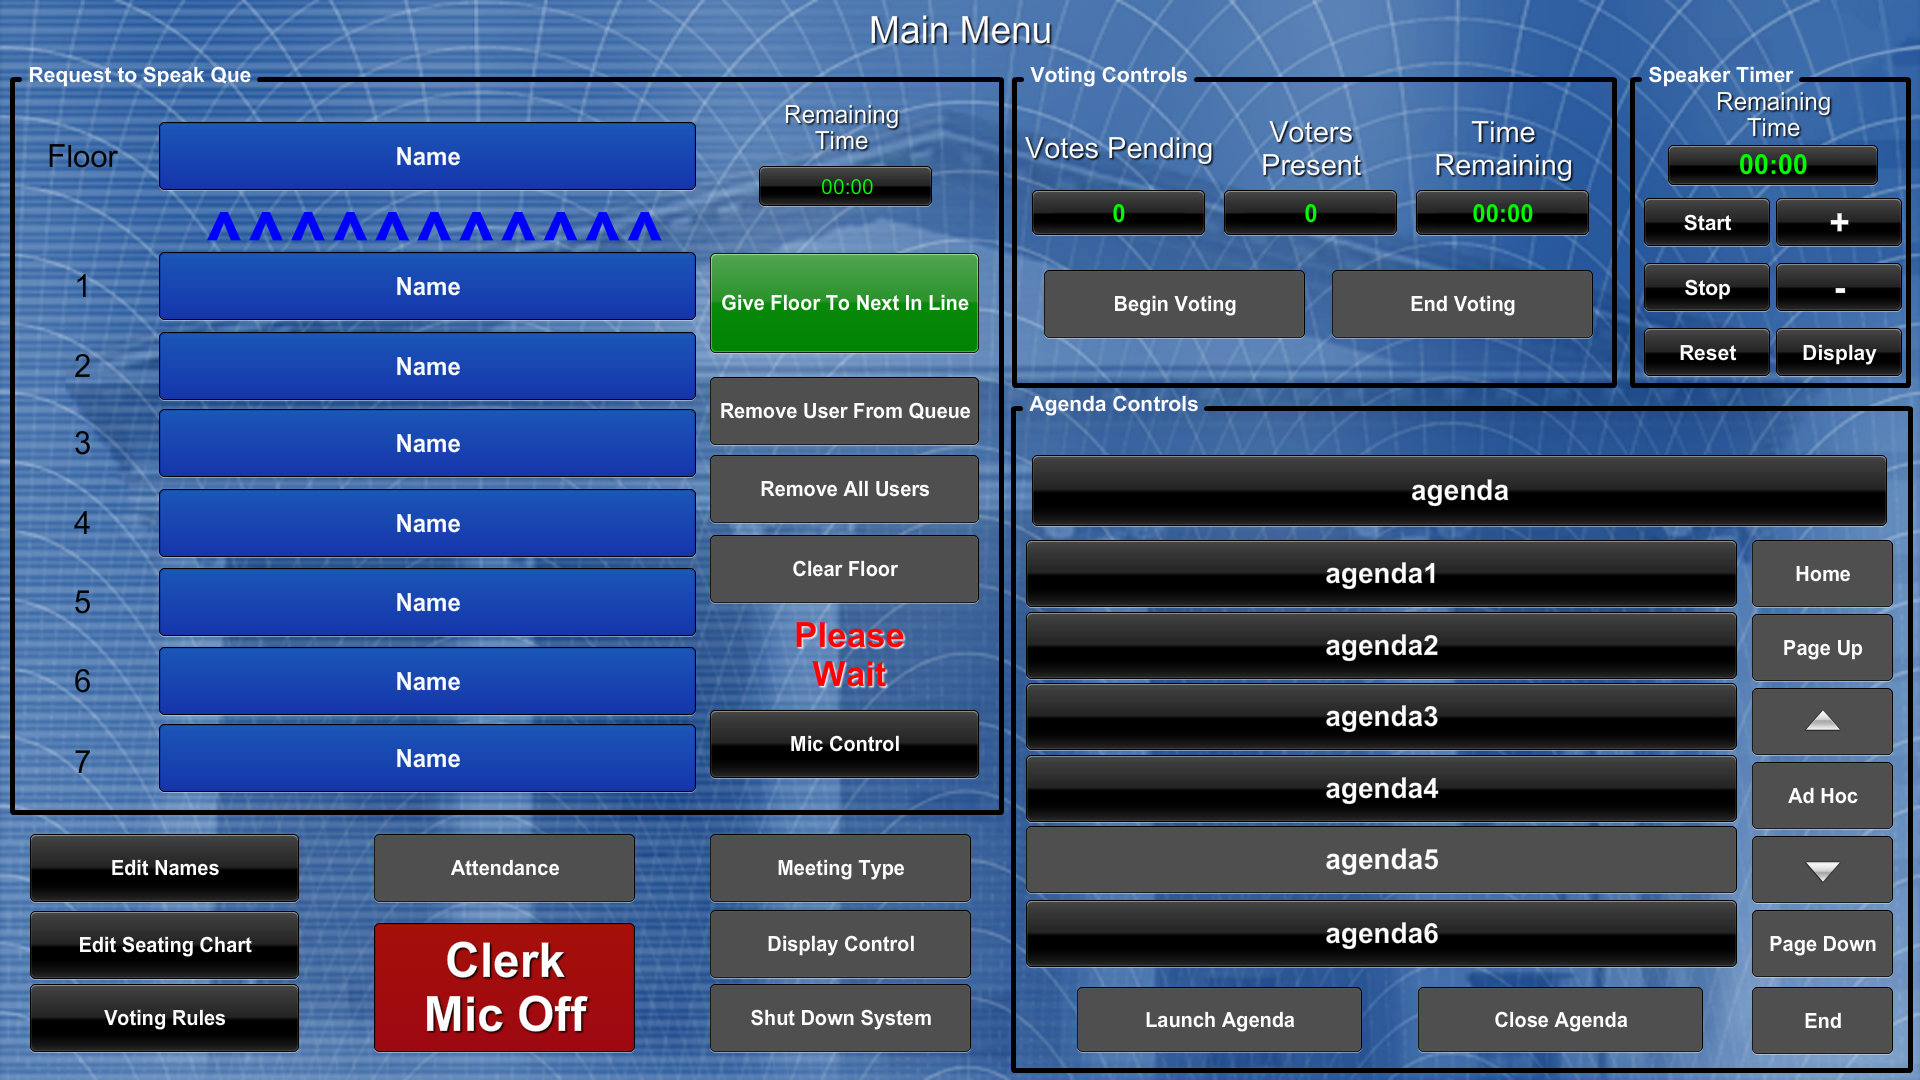 st john clerk dge100 v0.2_Main Page.jpg